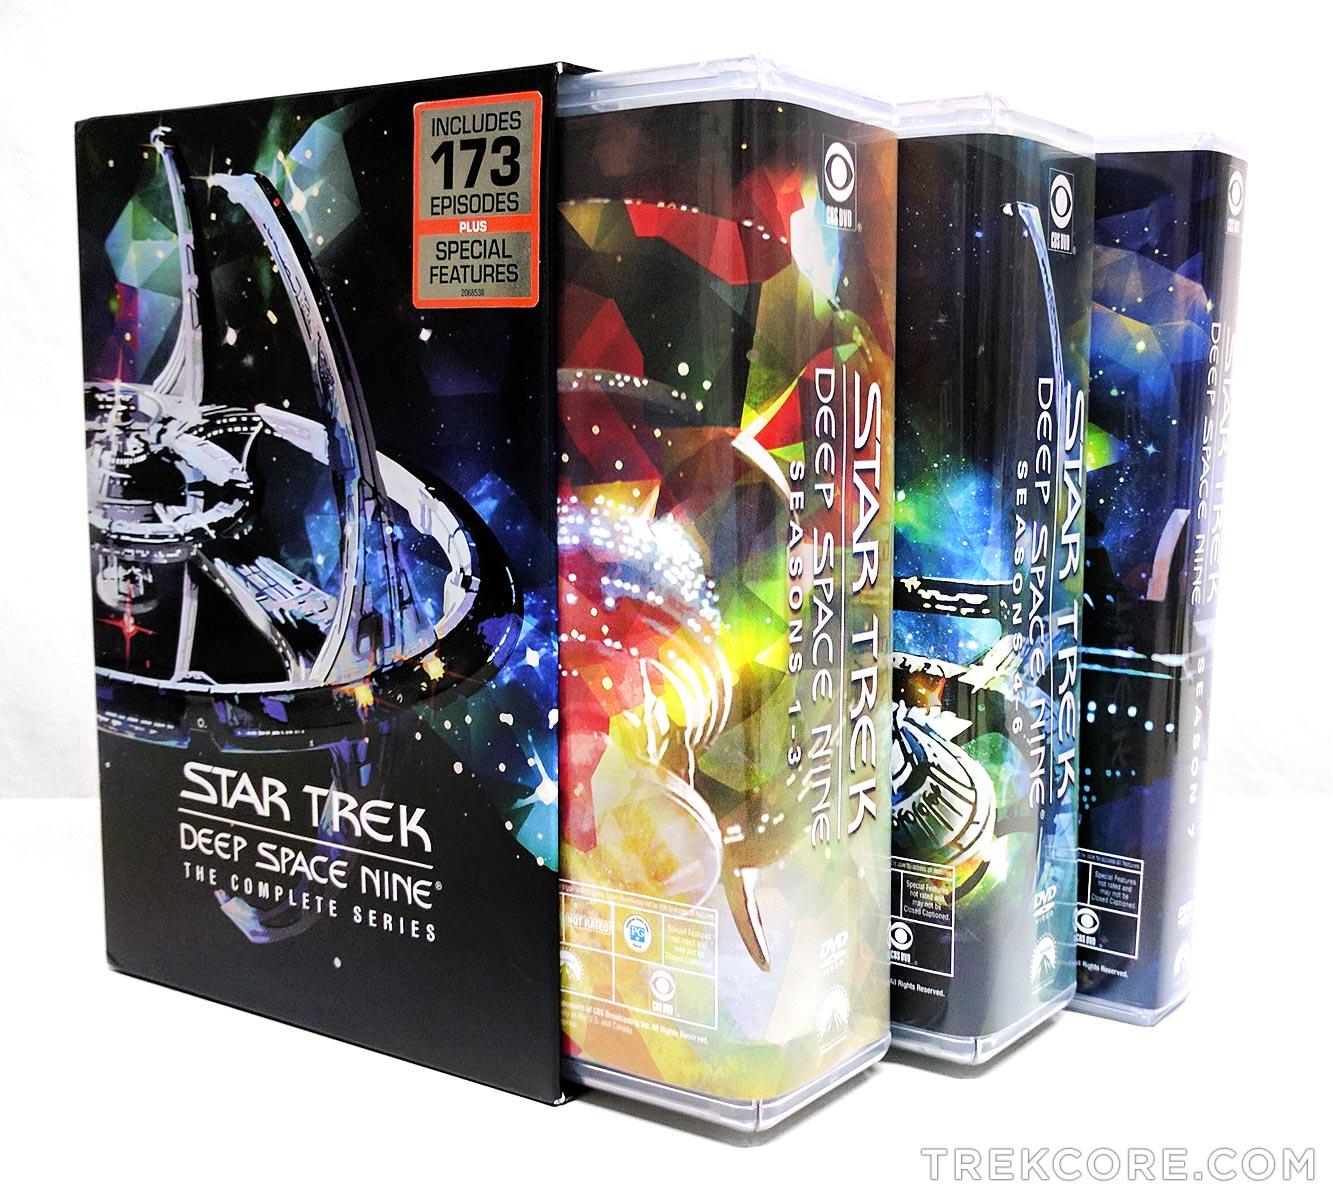 ds9-box-03